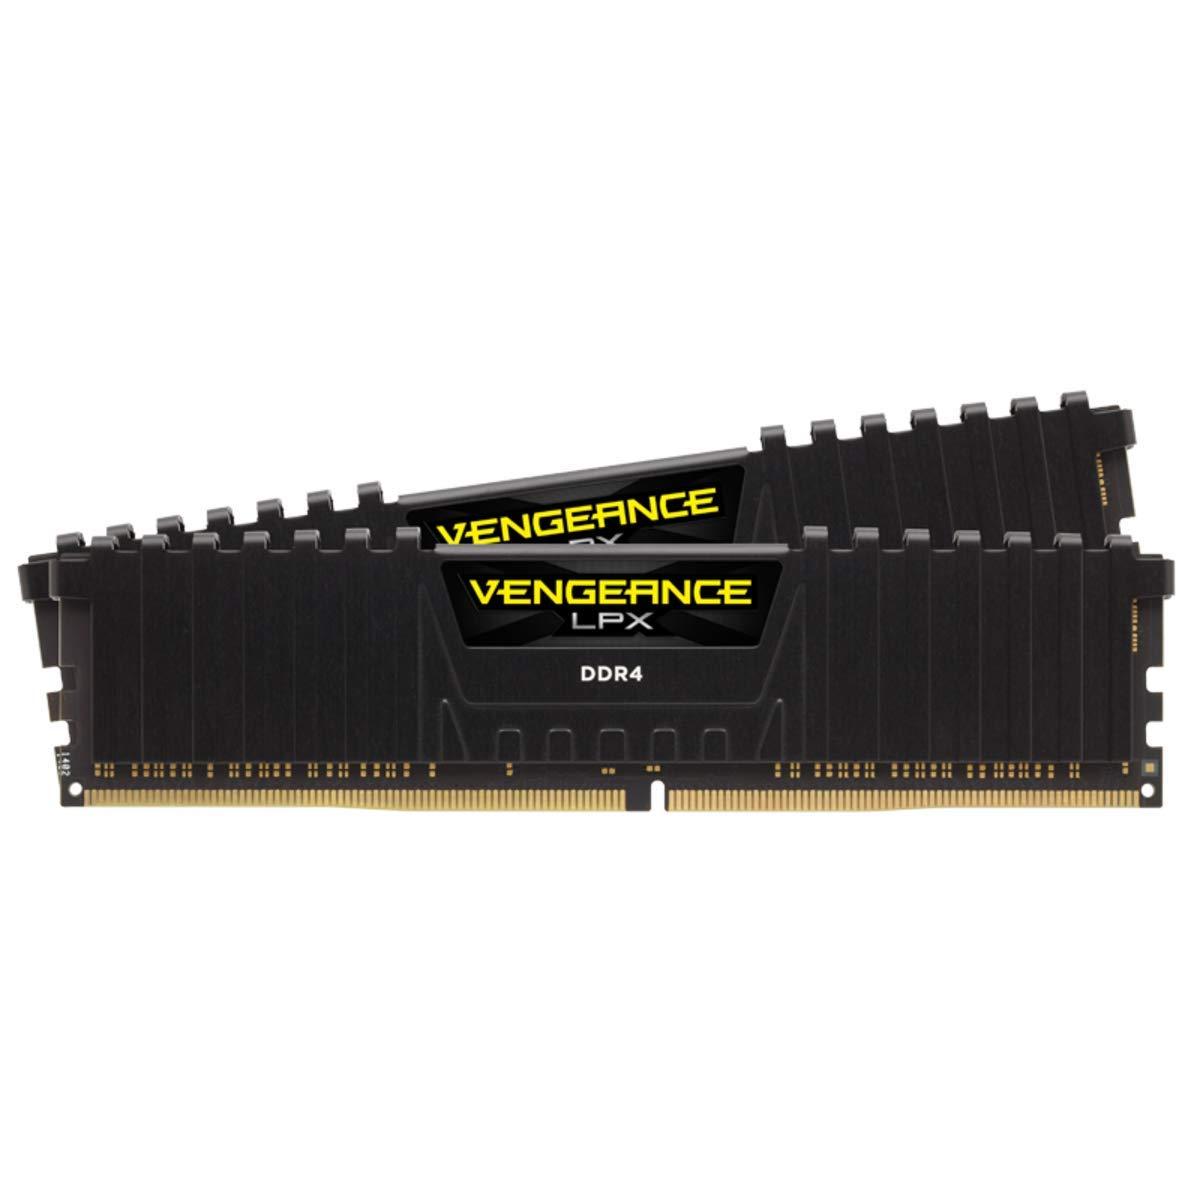 PC4-25600 Black C16 1.35V Desktop Memory 2 X 16GB DDR4 3200 Corsair Vengeance LPX 32GB